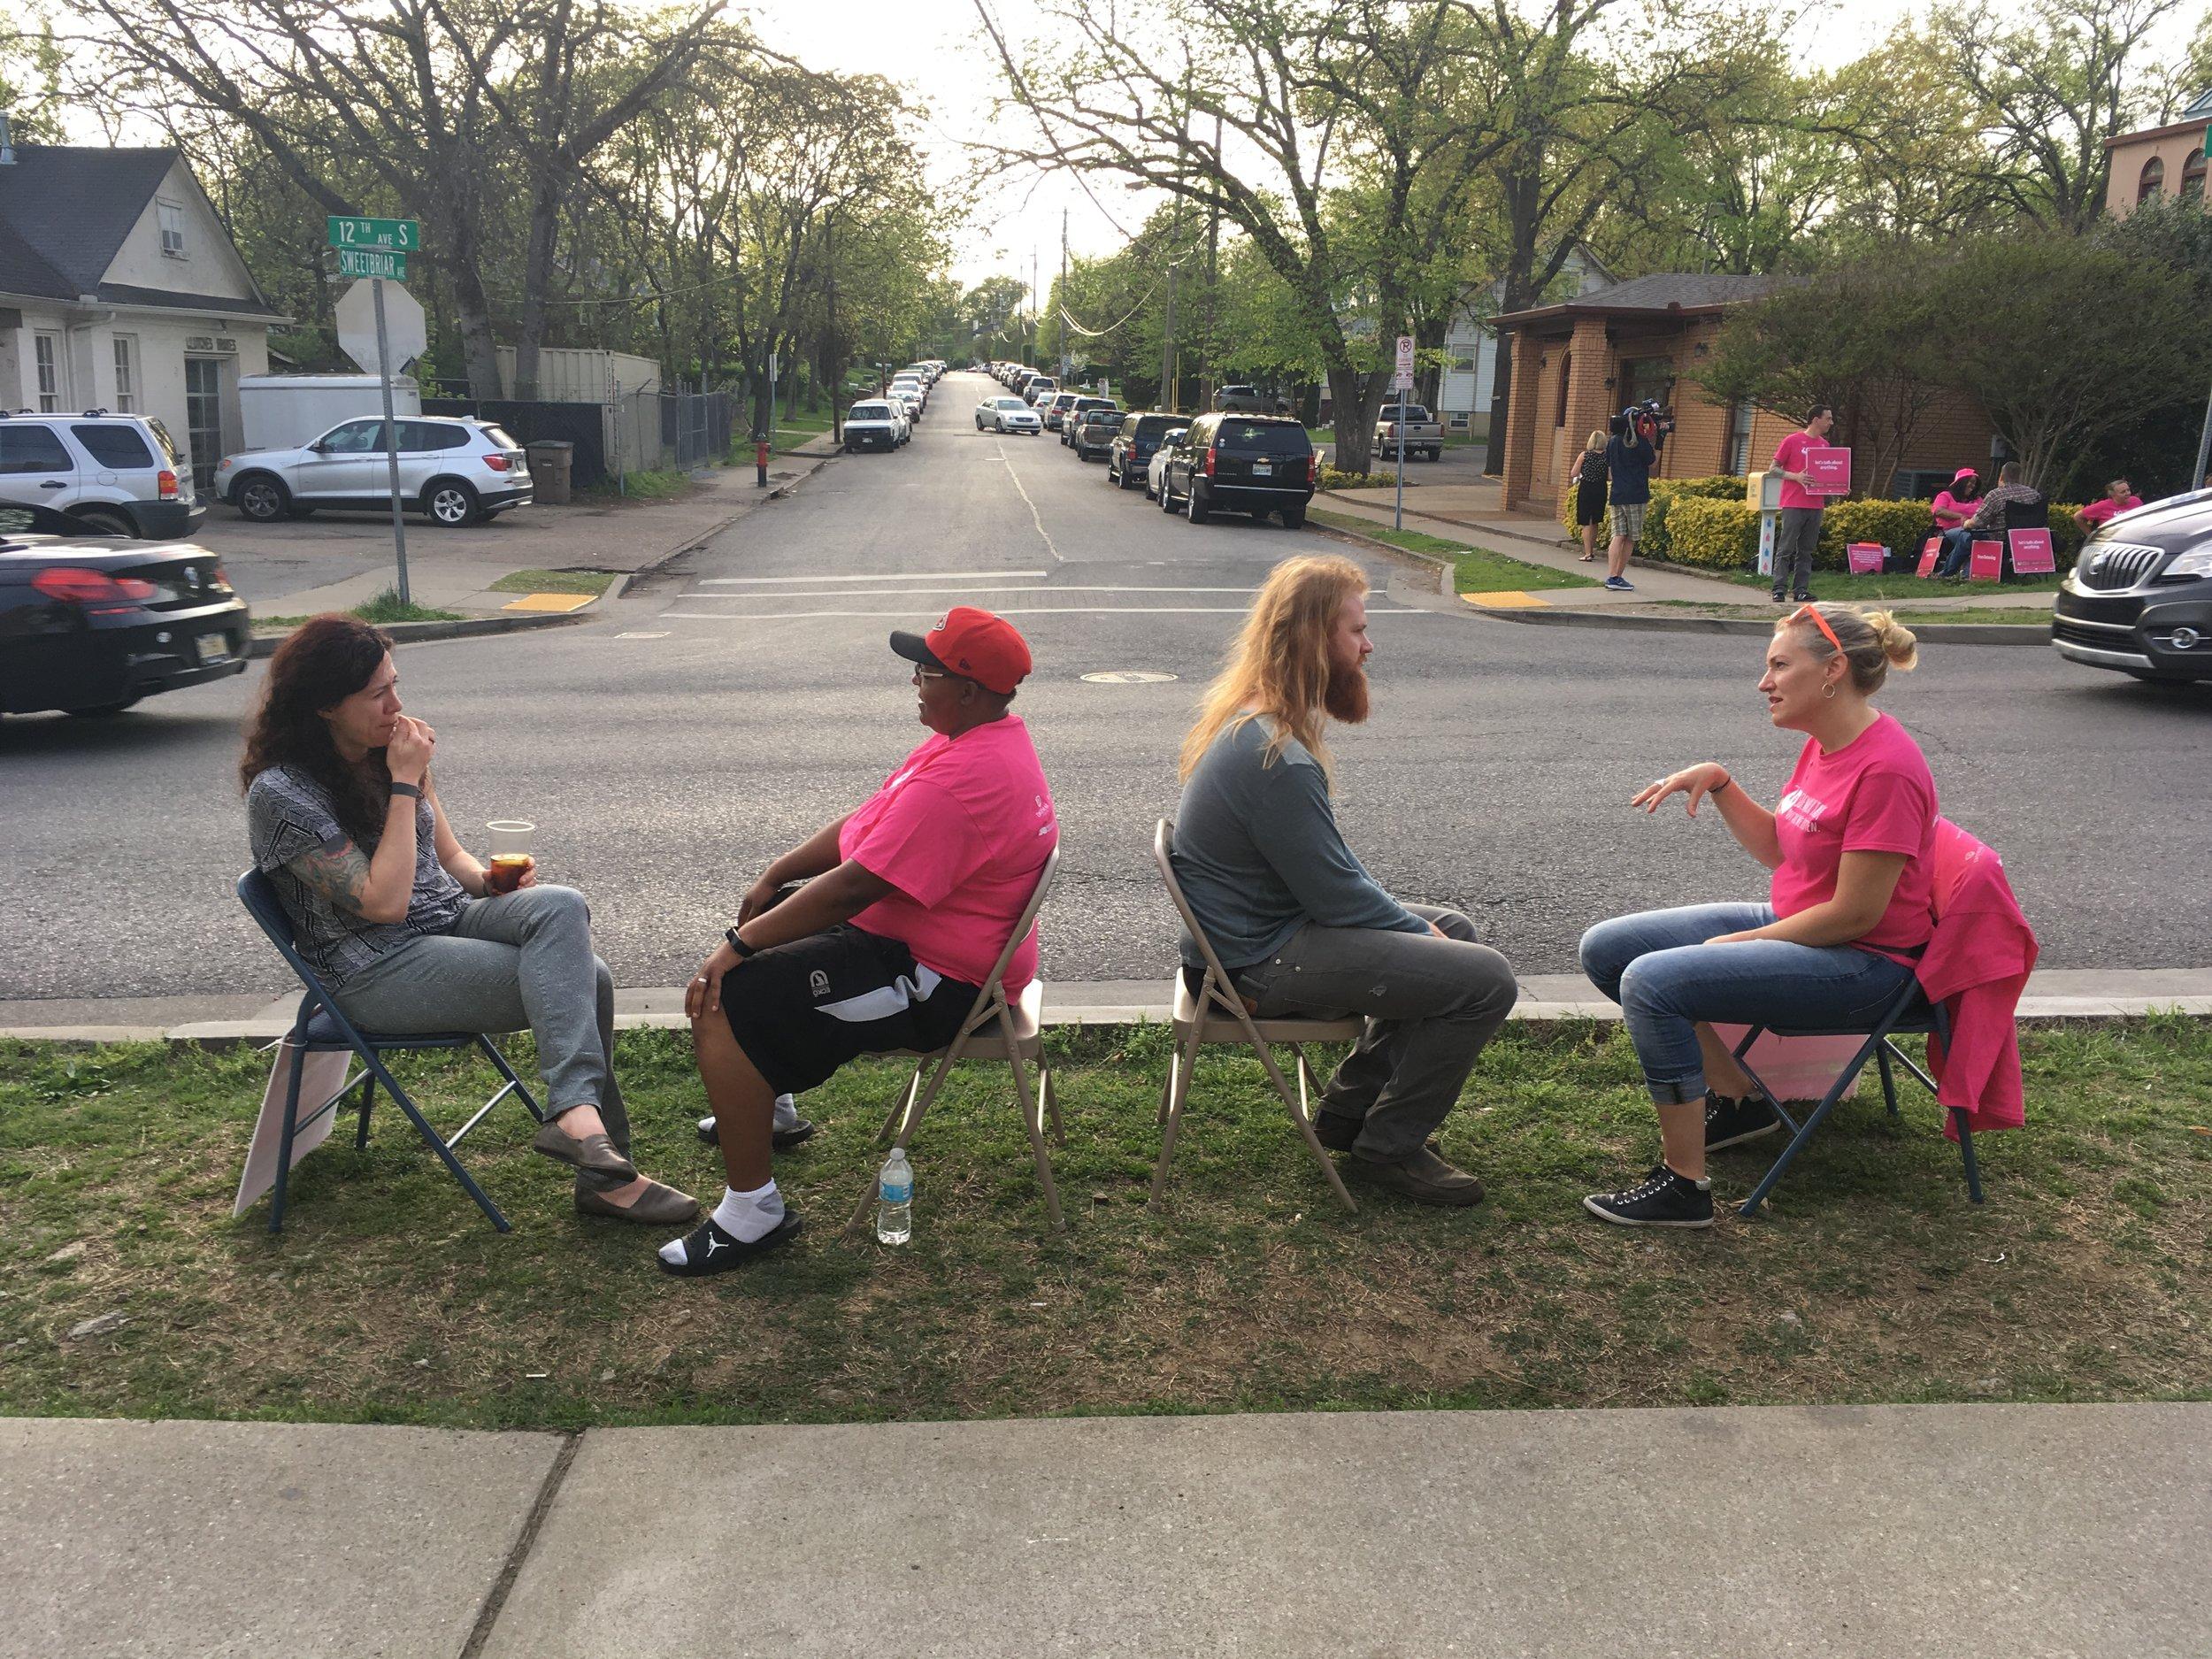 Sidewalk Talk - Radical Connection through empathetic listening on the streets